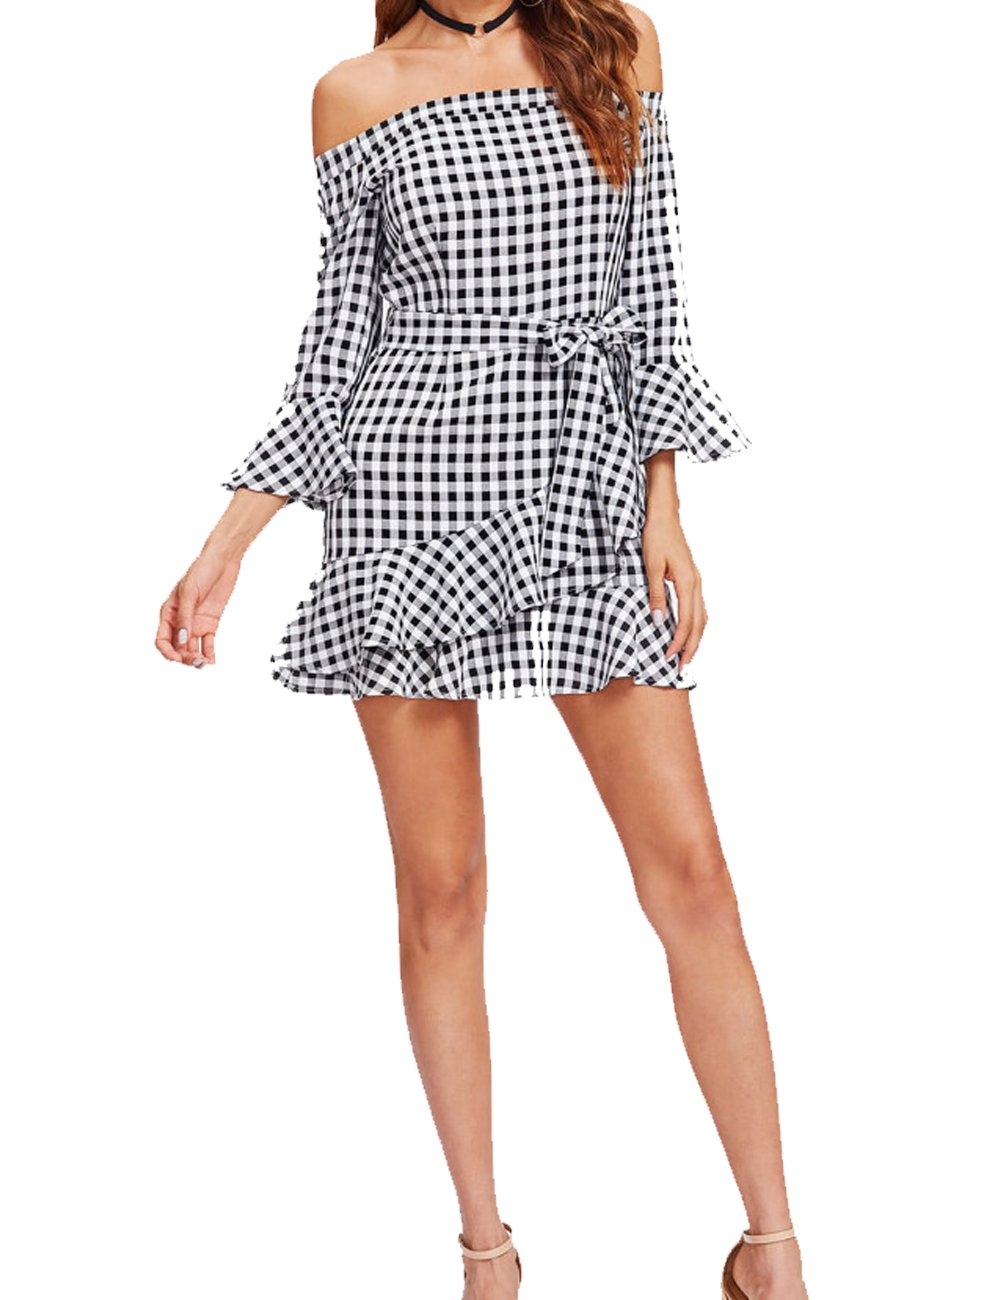 Women's Summer Off Shoulder Casual 3/4 Sleeve Tunic Dress Striped Mini Dress XL